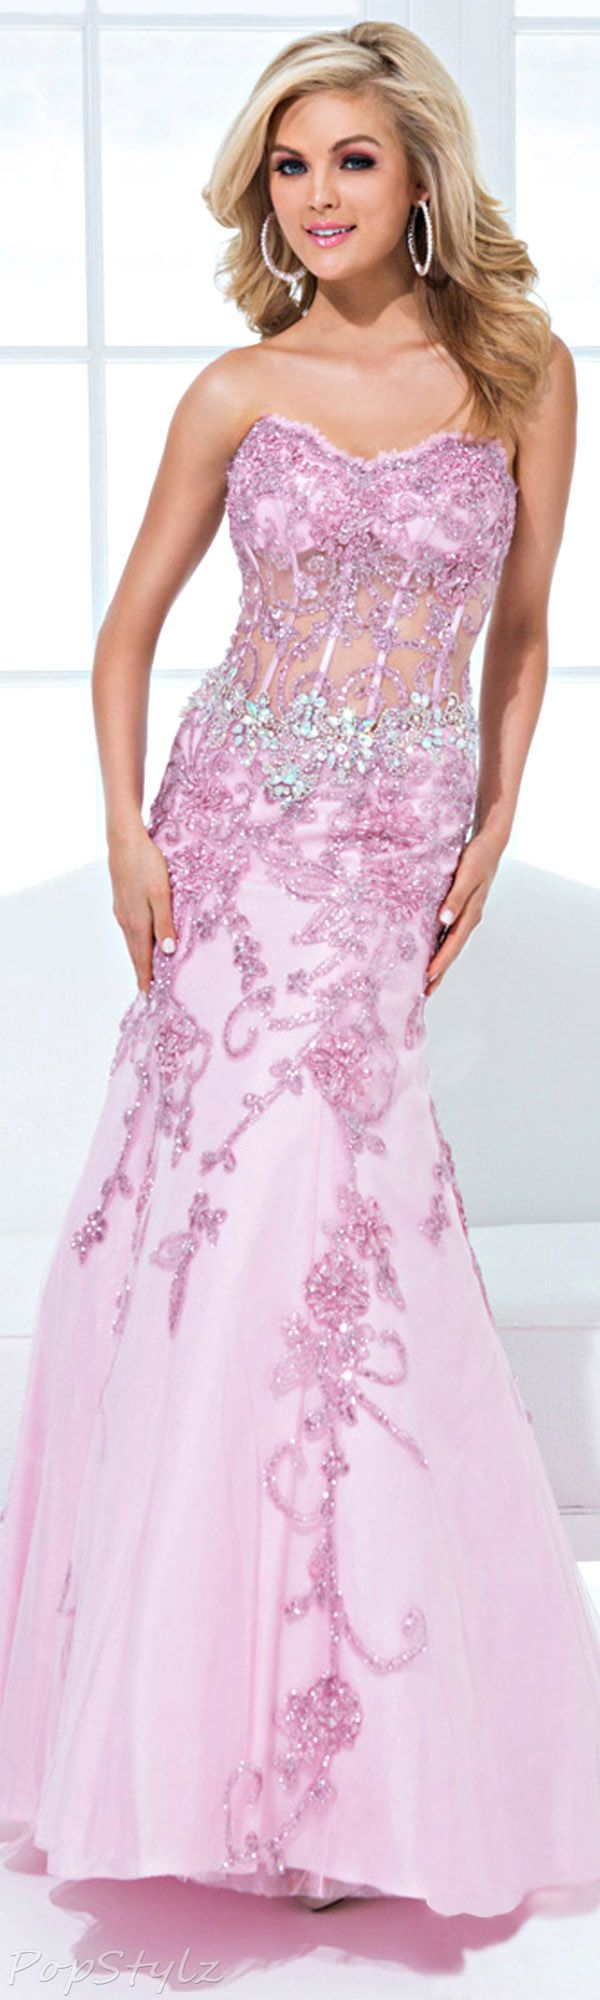 367 mejores imágenes sobre Beautiful Gown\'s en Pinterest | Vestidos ...